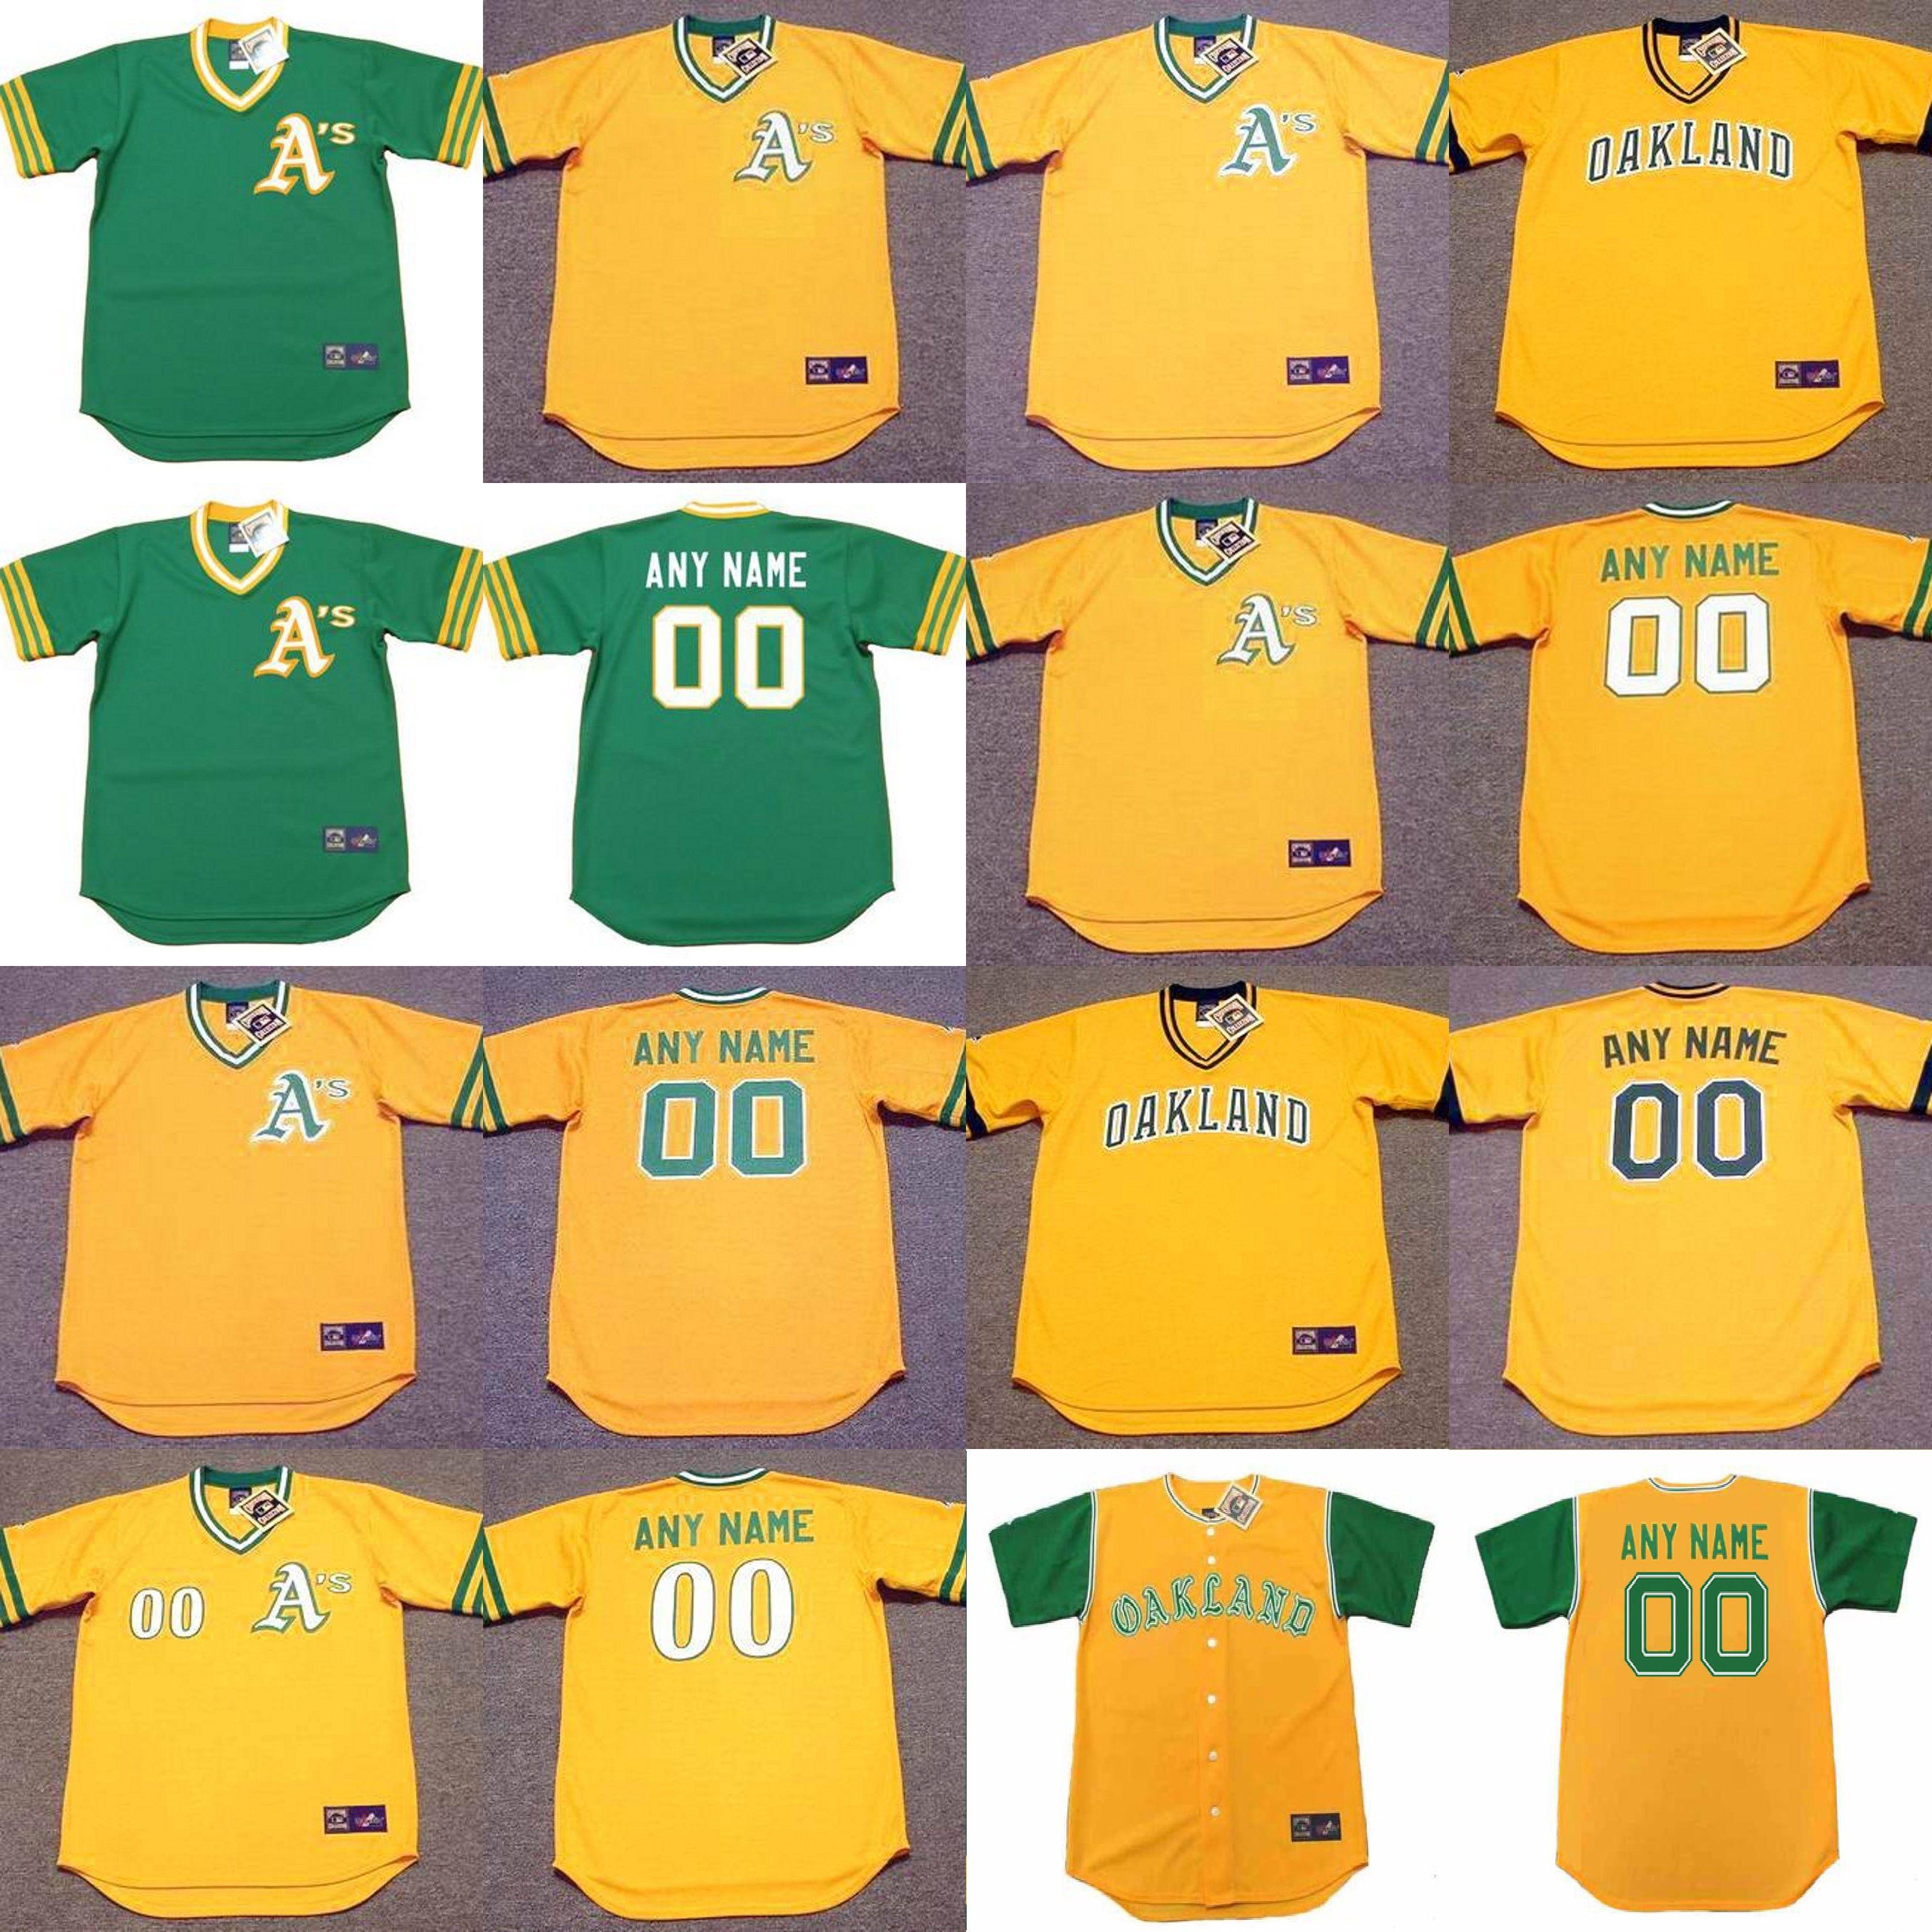 quality design 12276 fcc72 oakland athletics blank yellow jersey